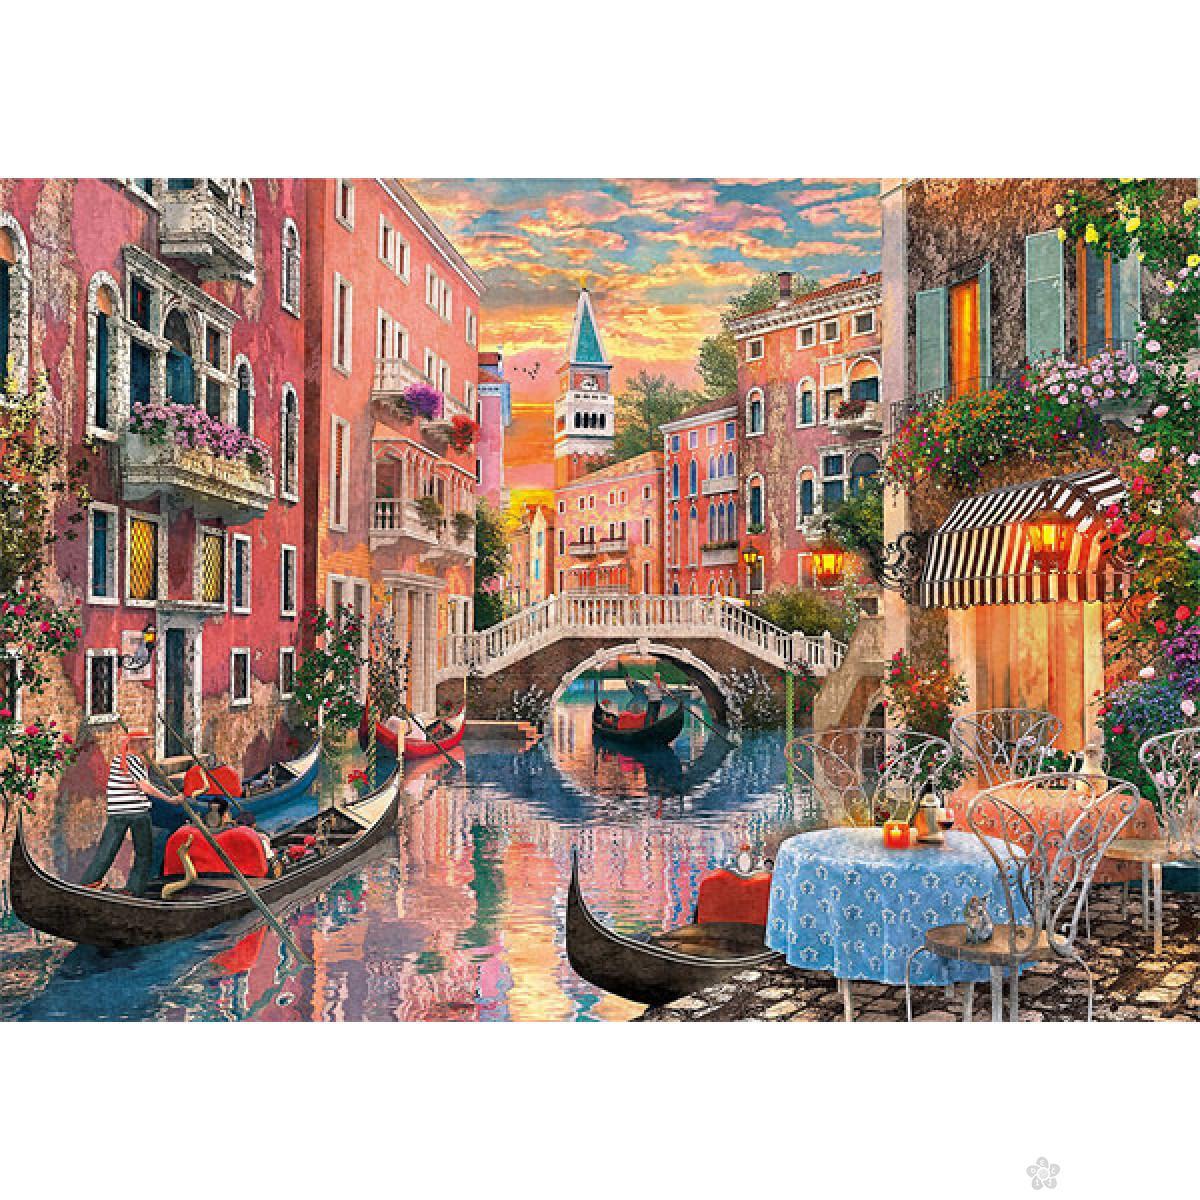 Clementoni puzzla Venice Evening Sunset 6000pcs 36524